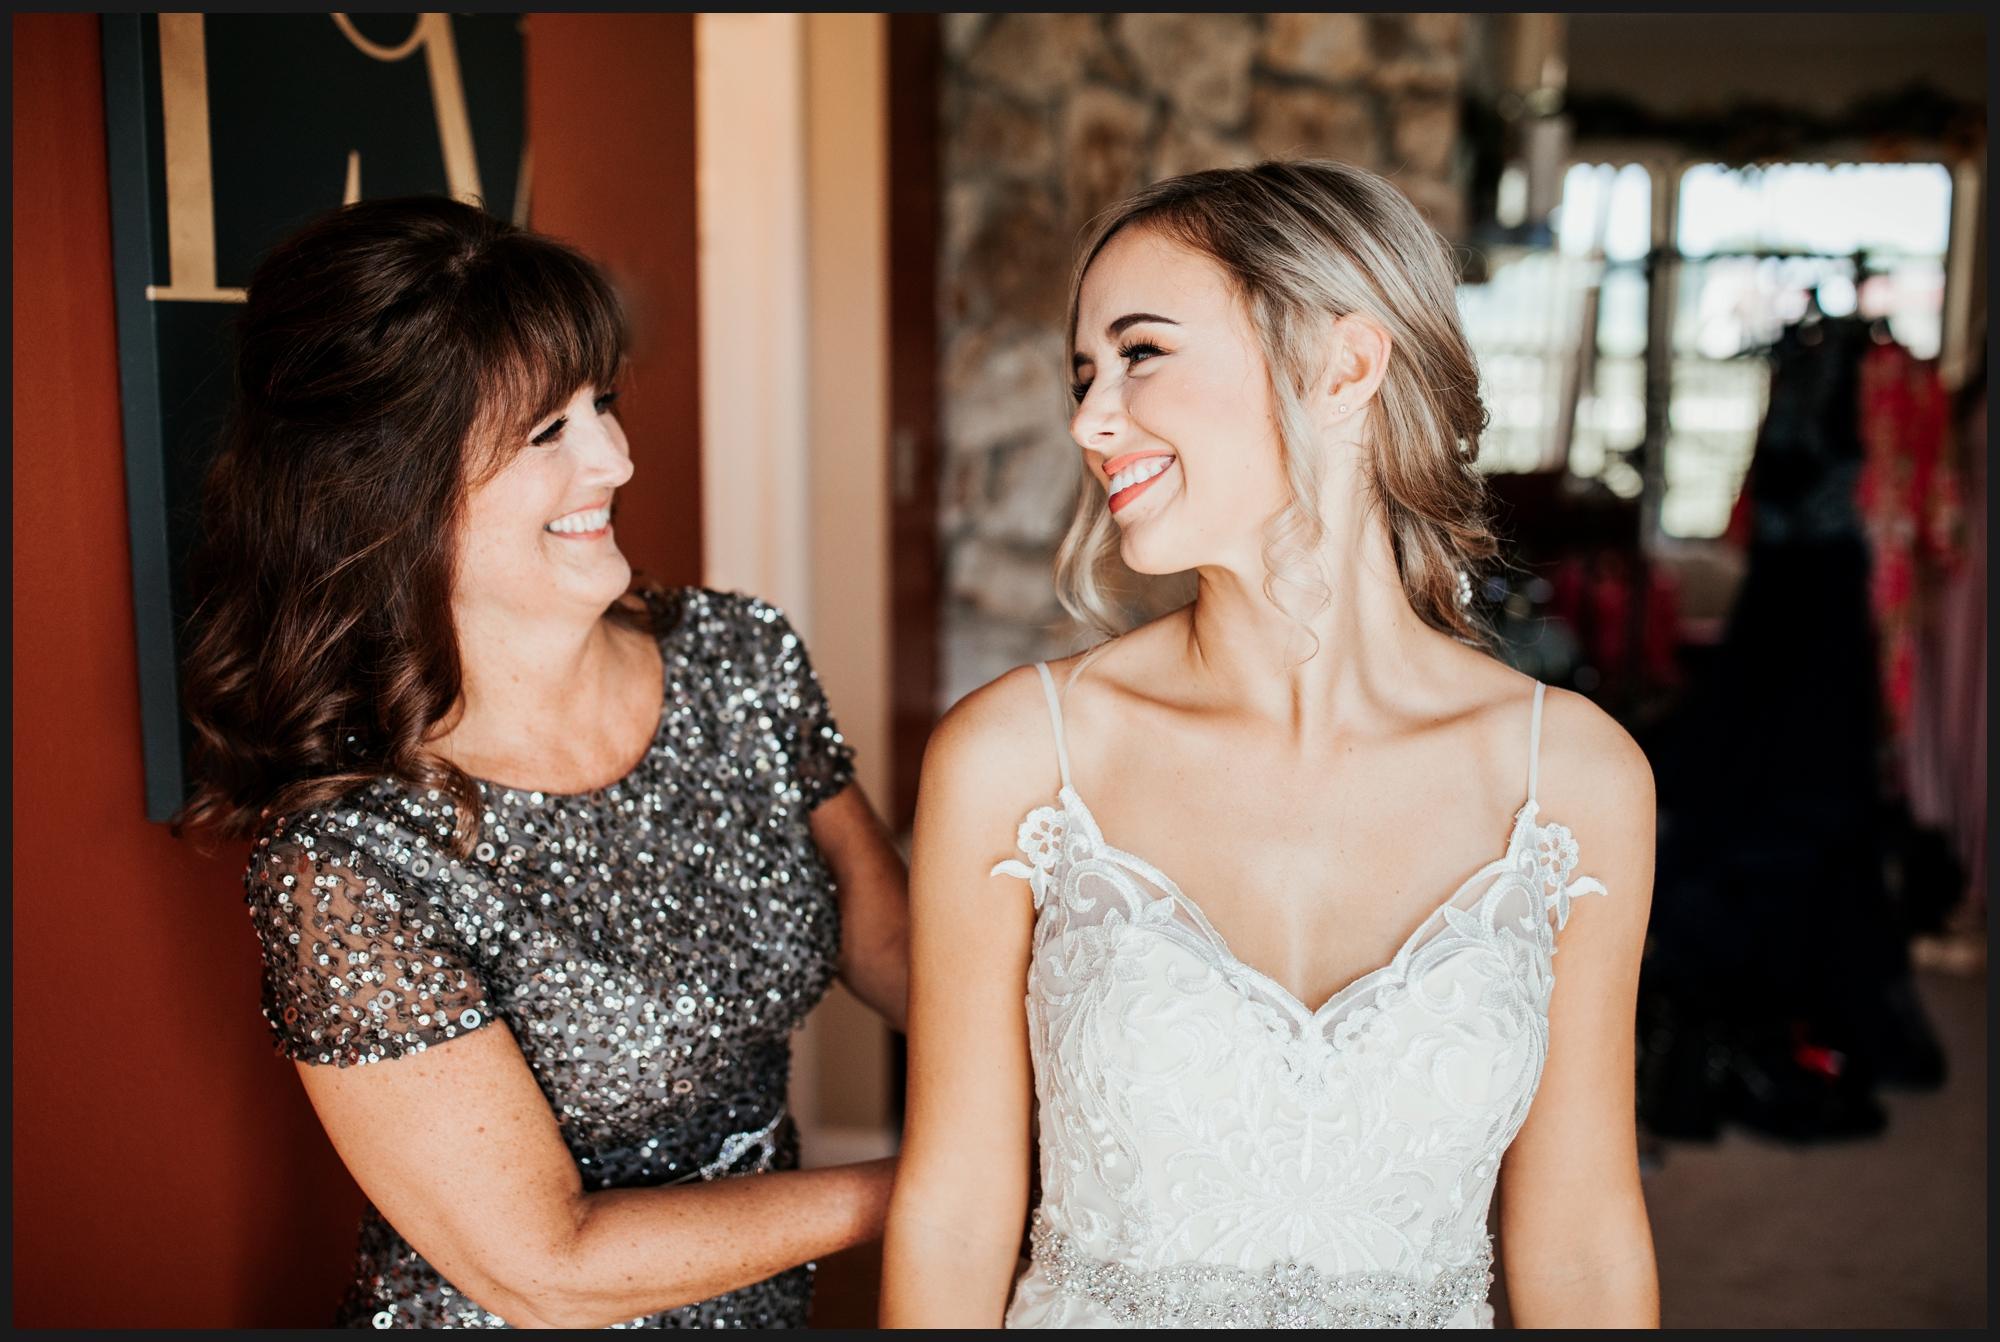 Orlando-Wedding-Photographer-destination-wedding-photographer-florida-wedding-photographer-hawaii-wedding-photographer_0282.jpg